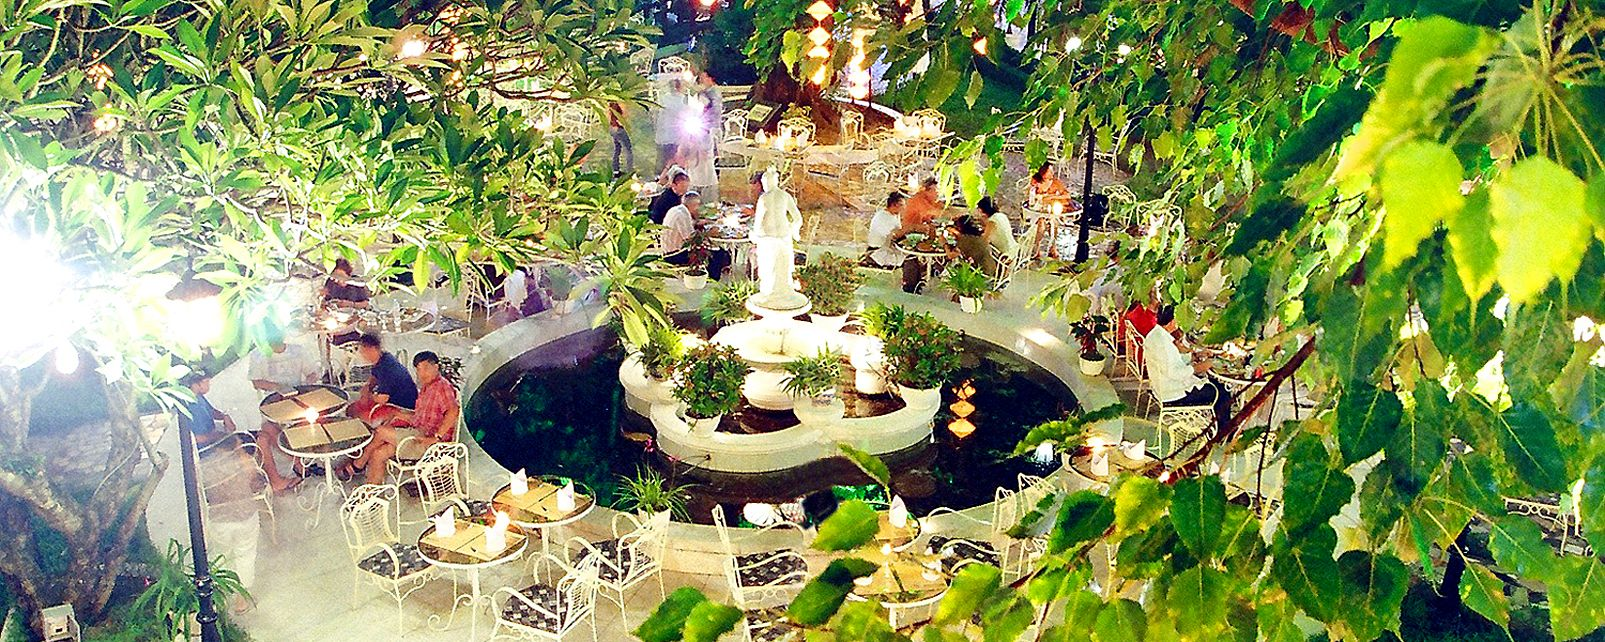 Hôtel Saigon Morin